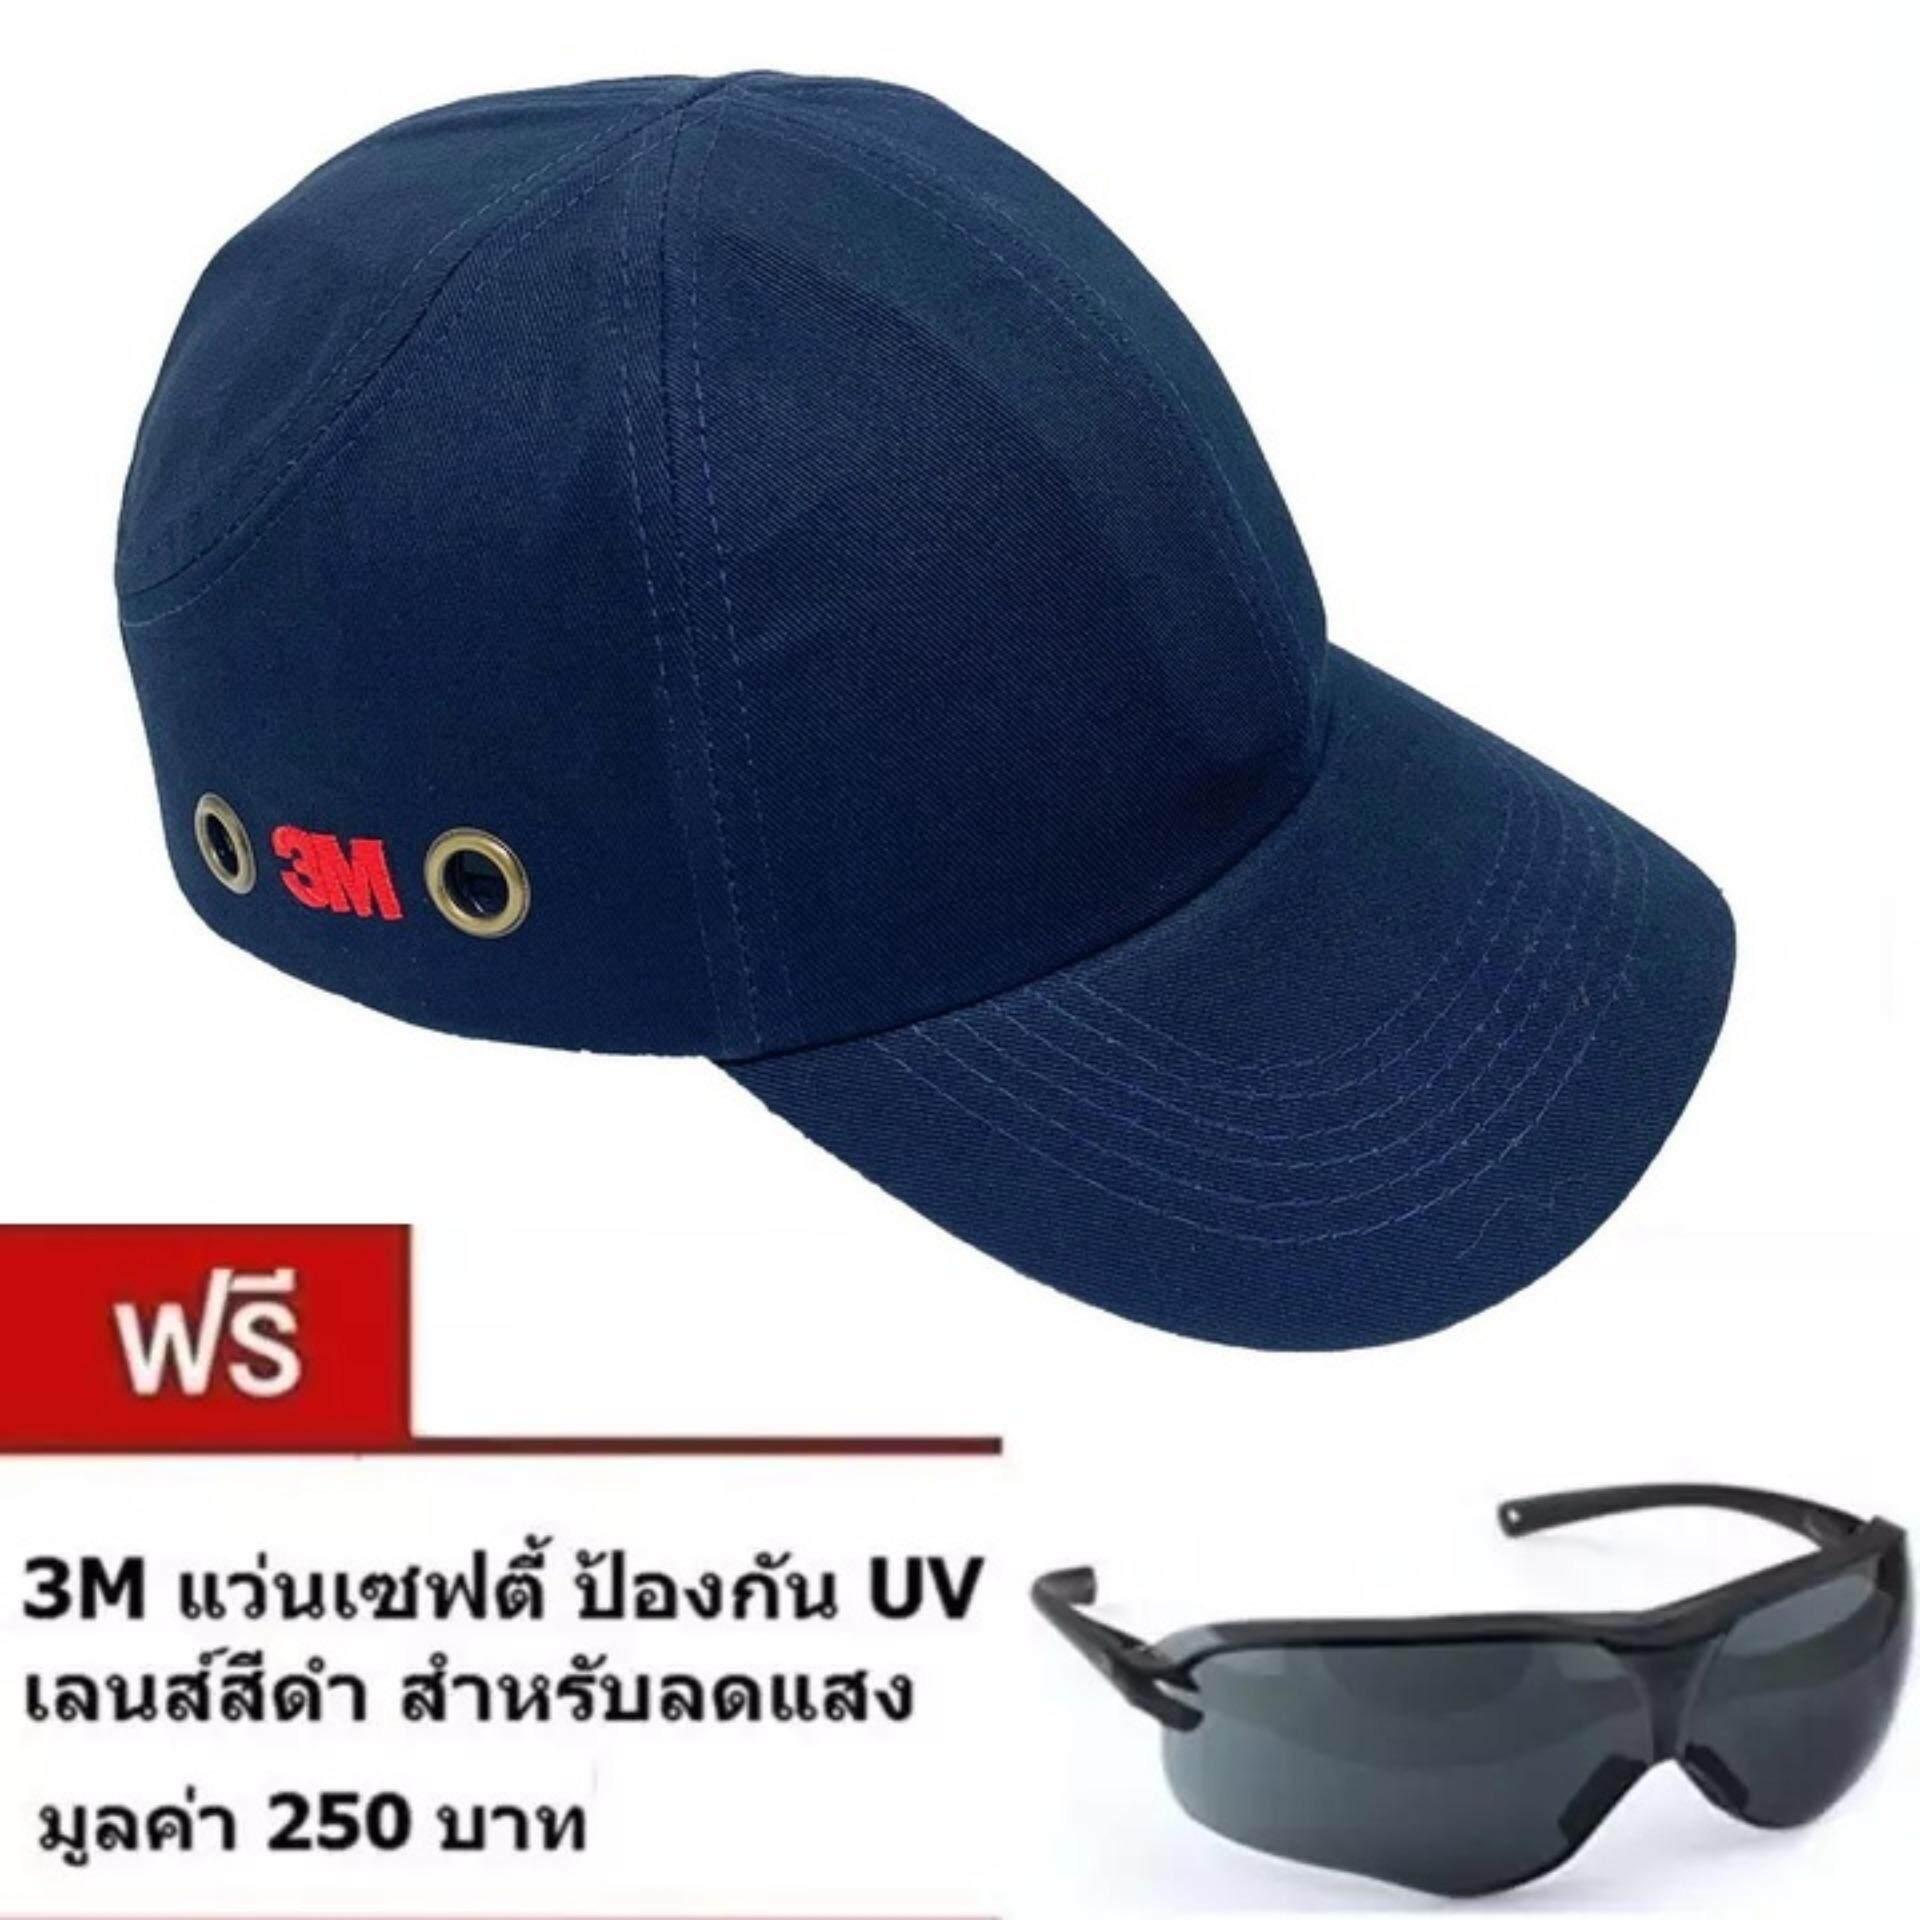 3M Comfort Cap หมวกแค็ป หมวกเสริมโครงนิรภัย EN812 standard แถม แว่นเซพตี้สีดำ 3m